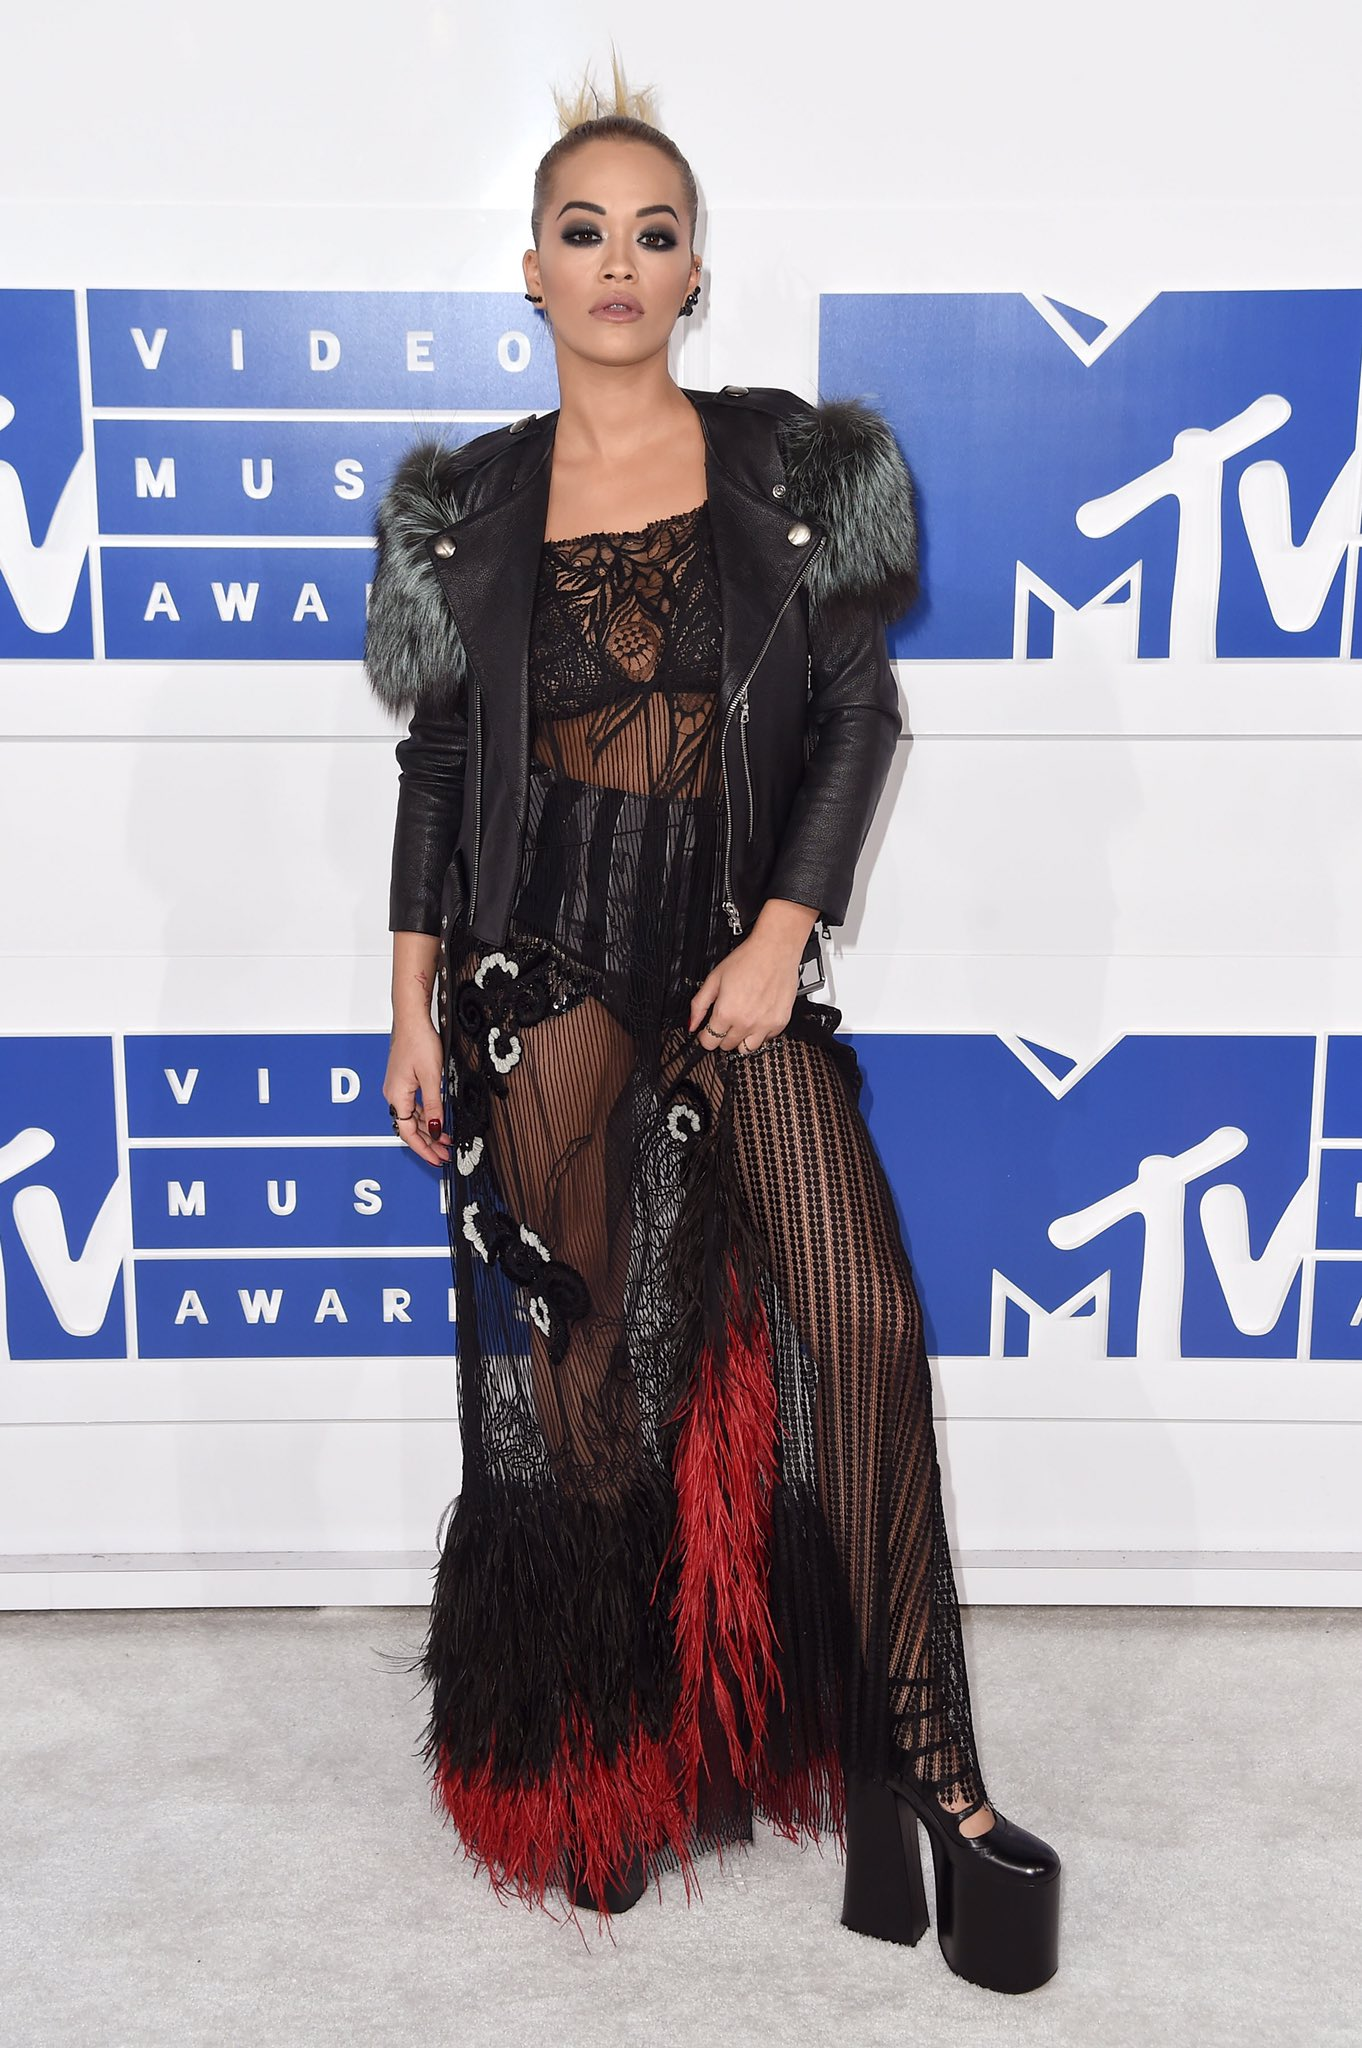 .@RitaOra wearing Marc Jacobs Fall '16 to tonight's #VMAs 🔥 https://t.co/ejQvBNtIID